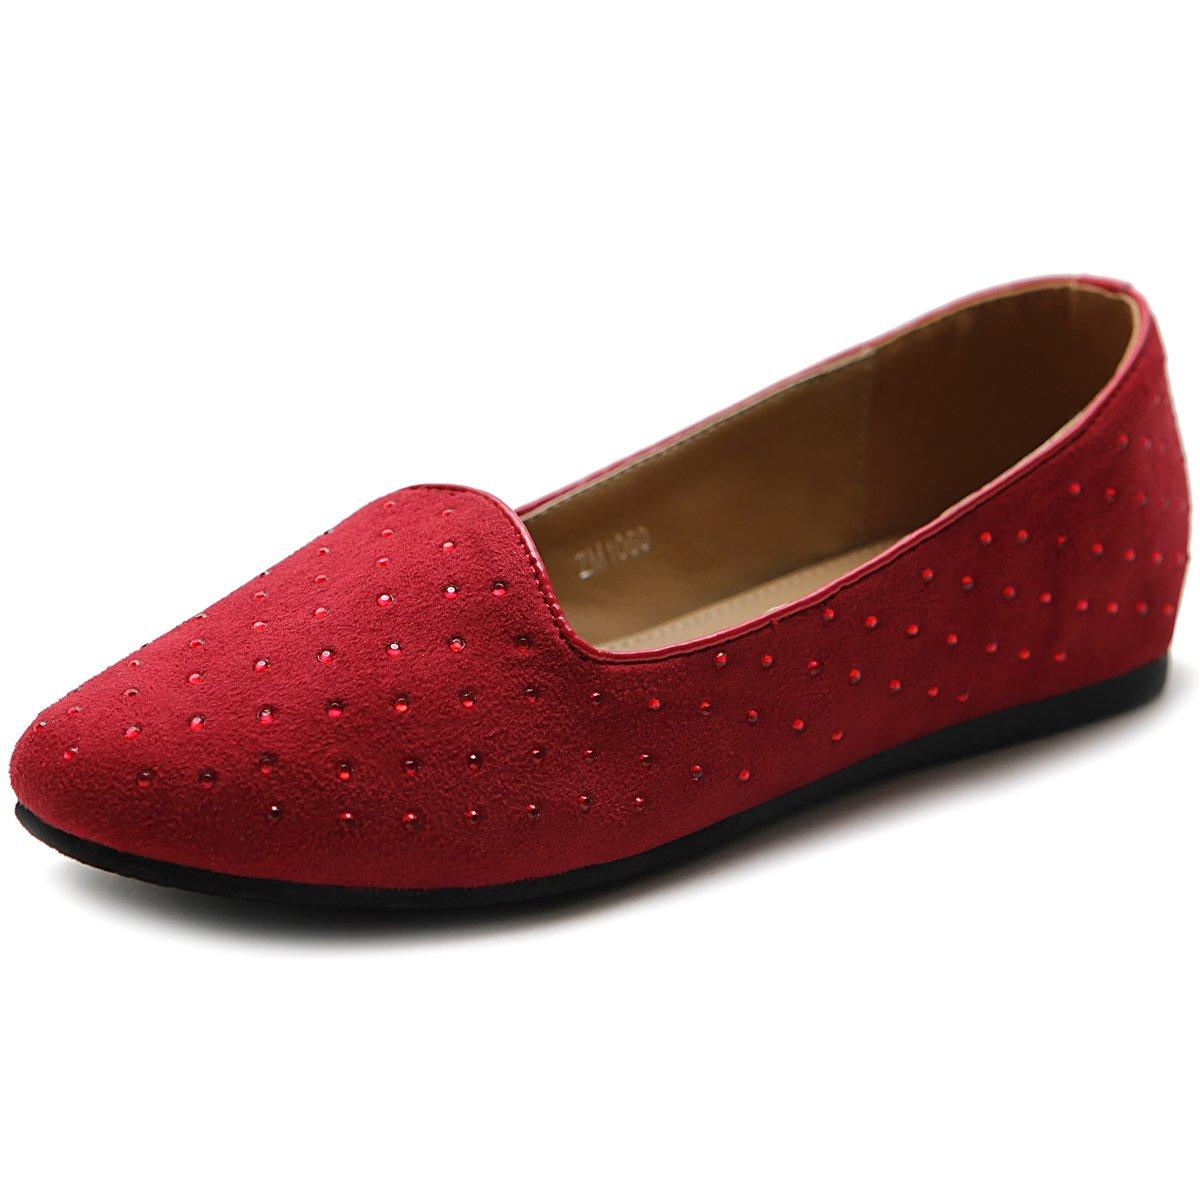 Ollio Women's Shoe Ballet Suede Jewel Stud Comfort Flat B00MV4HZJM 8 B(M) US|Red